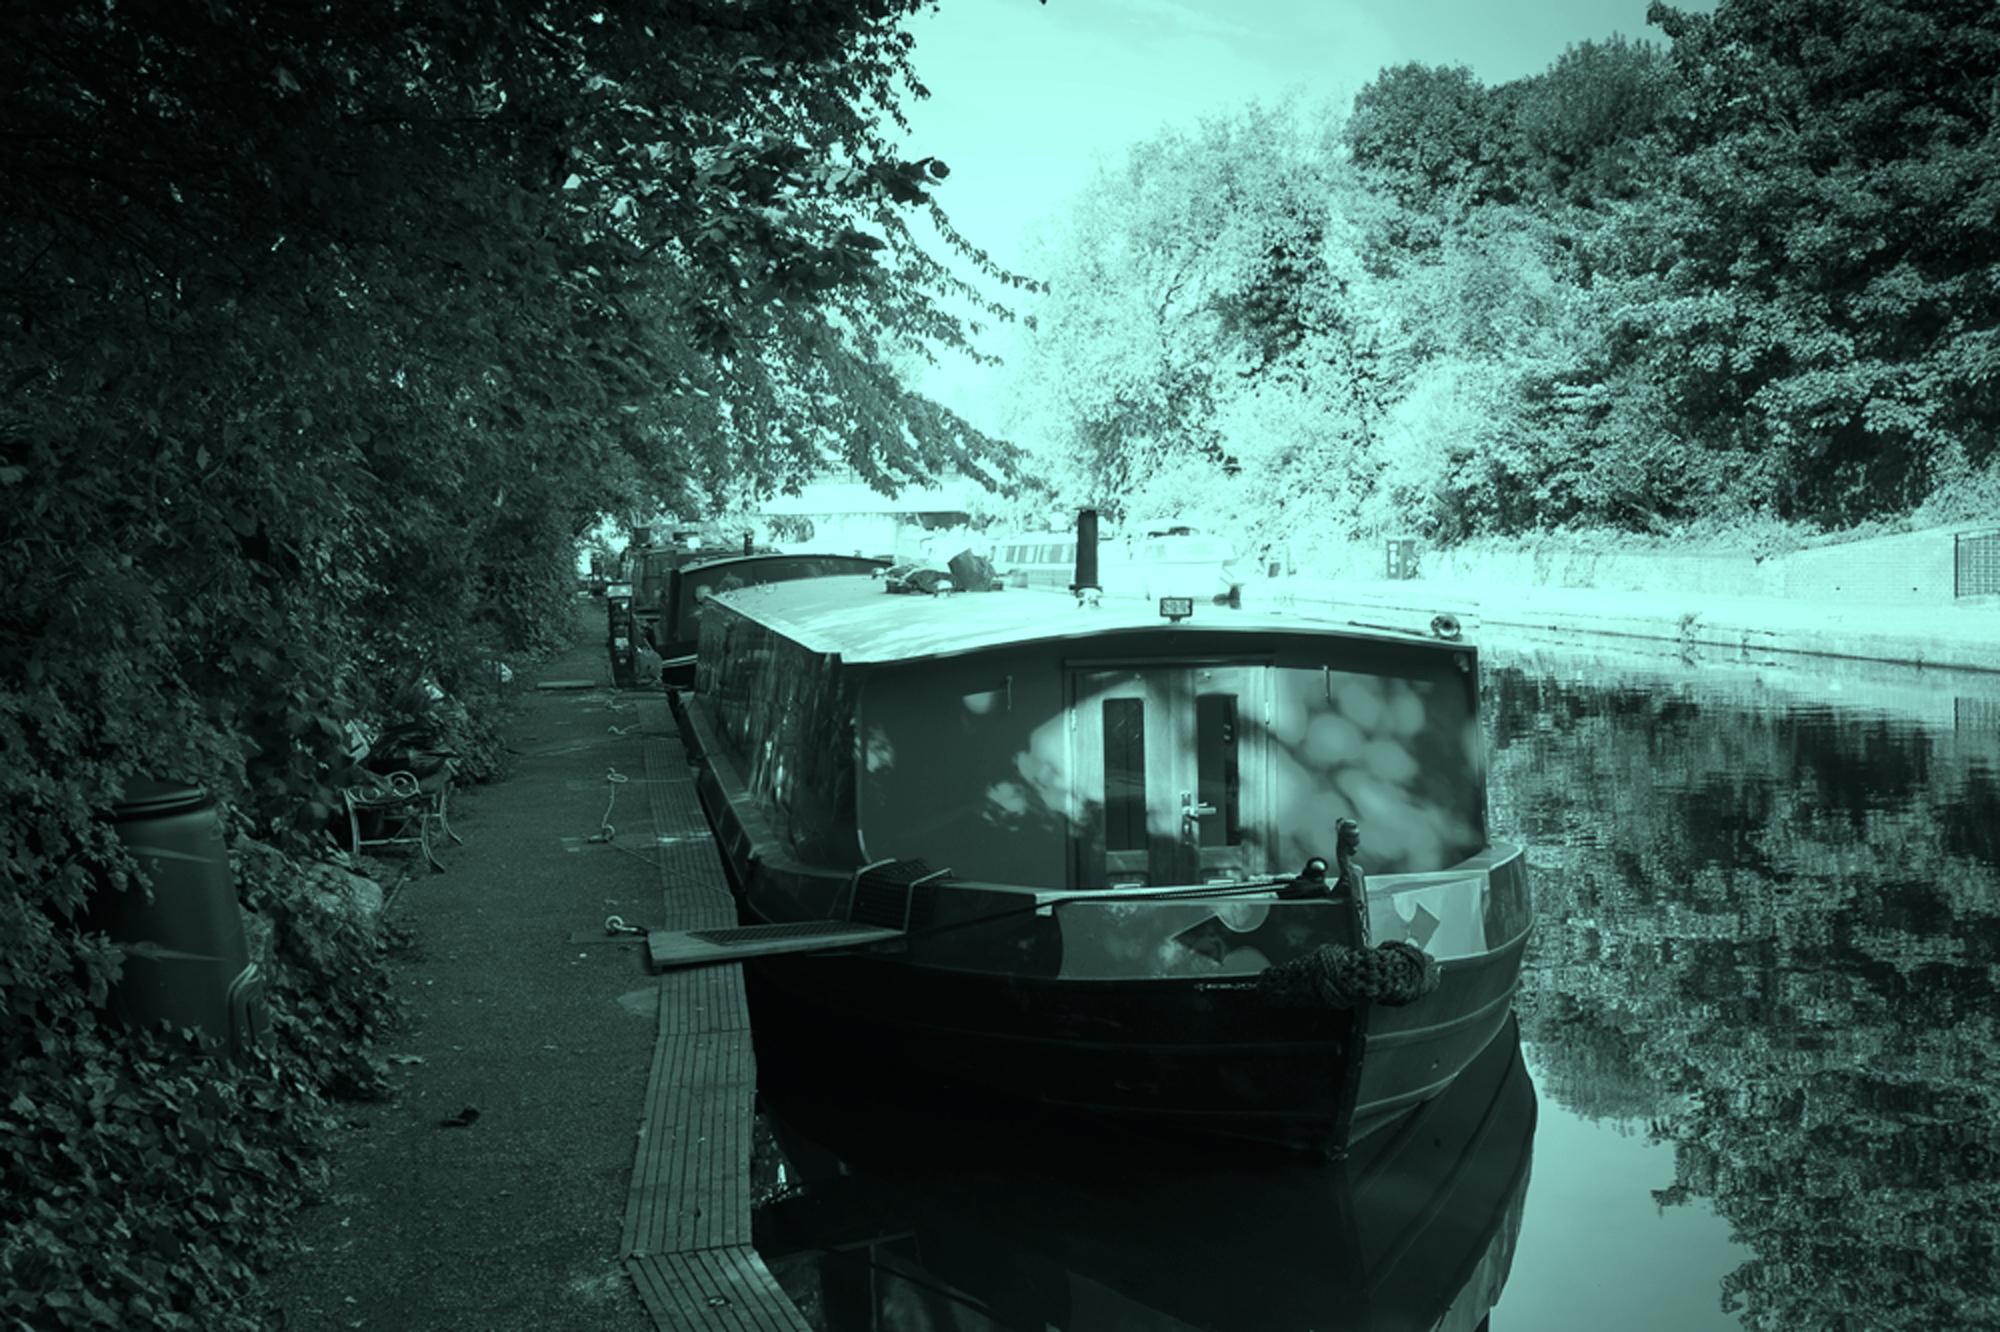 Fife-Terrace-2.jpg